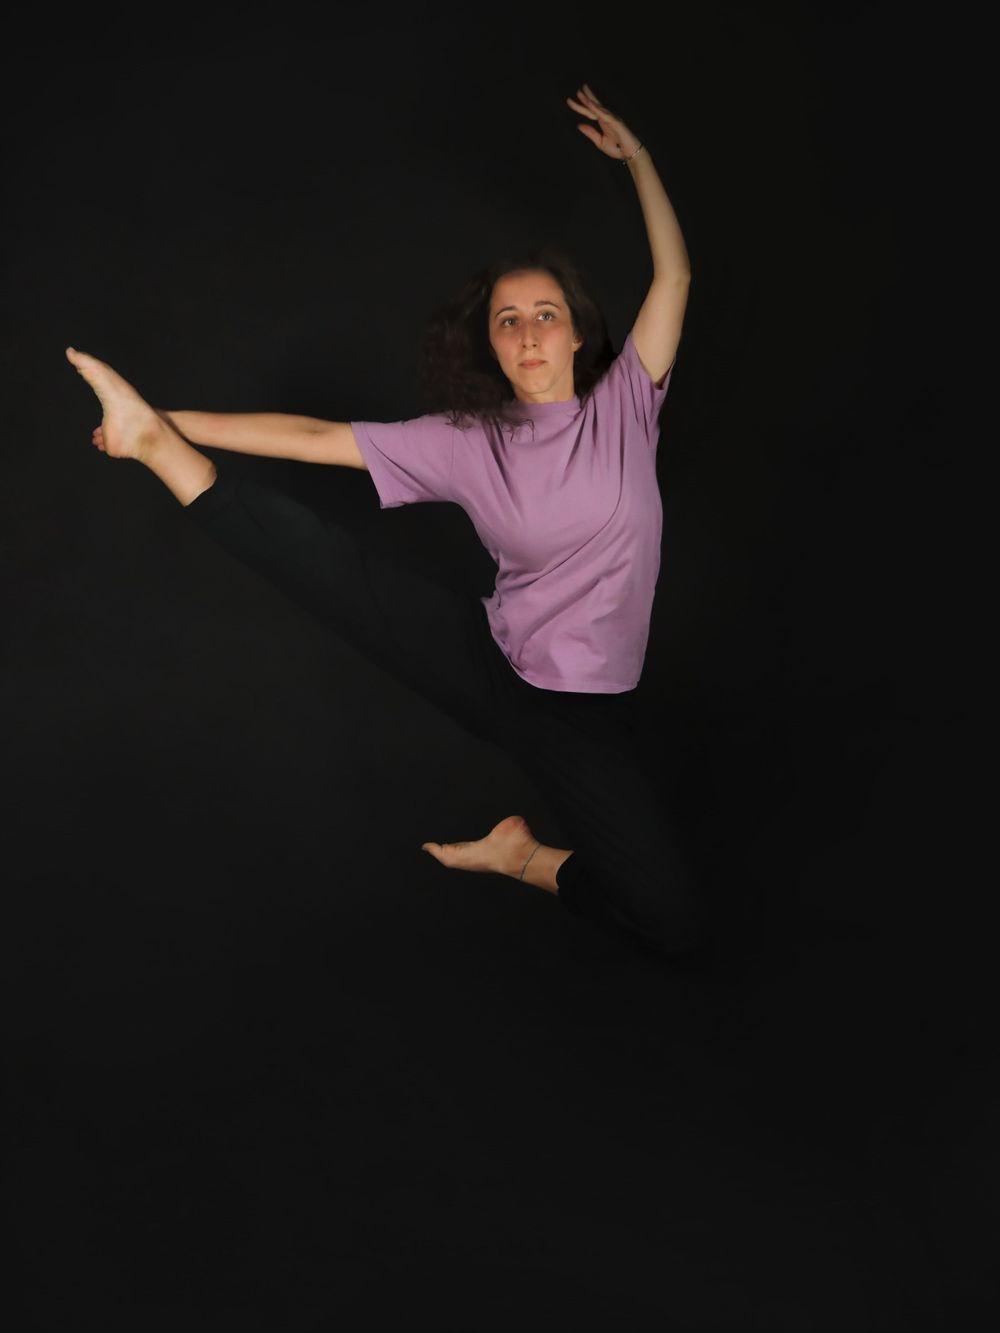 danza moderna per bambini